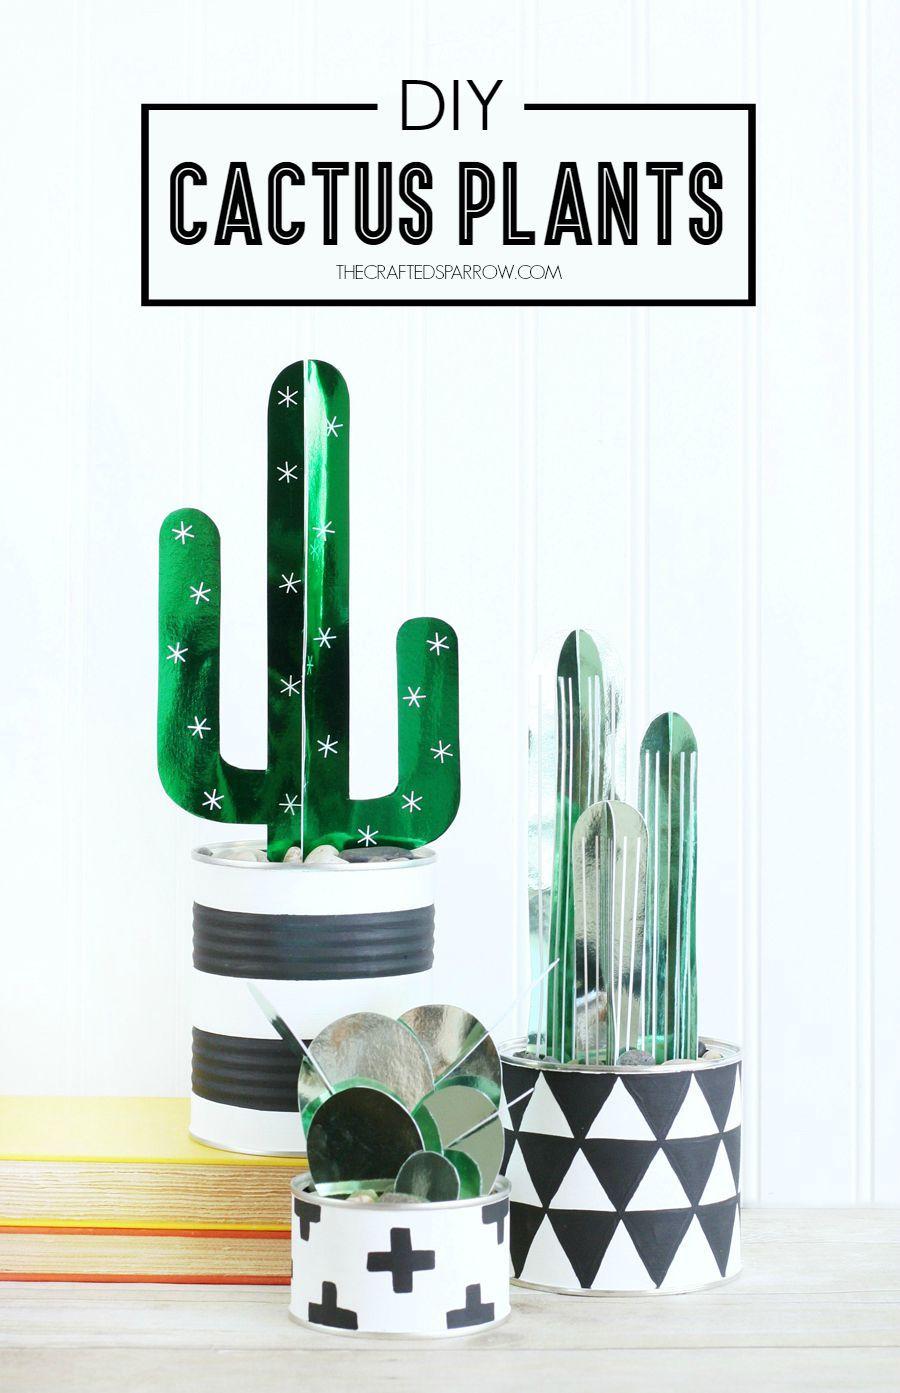 DIY Cactus Plants (Includes free printable templates) - thecraftedsparrow.com #HSMinc [ad]